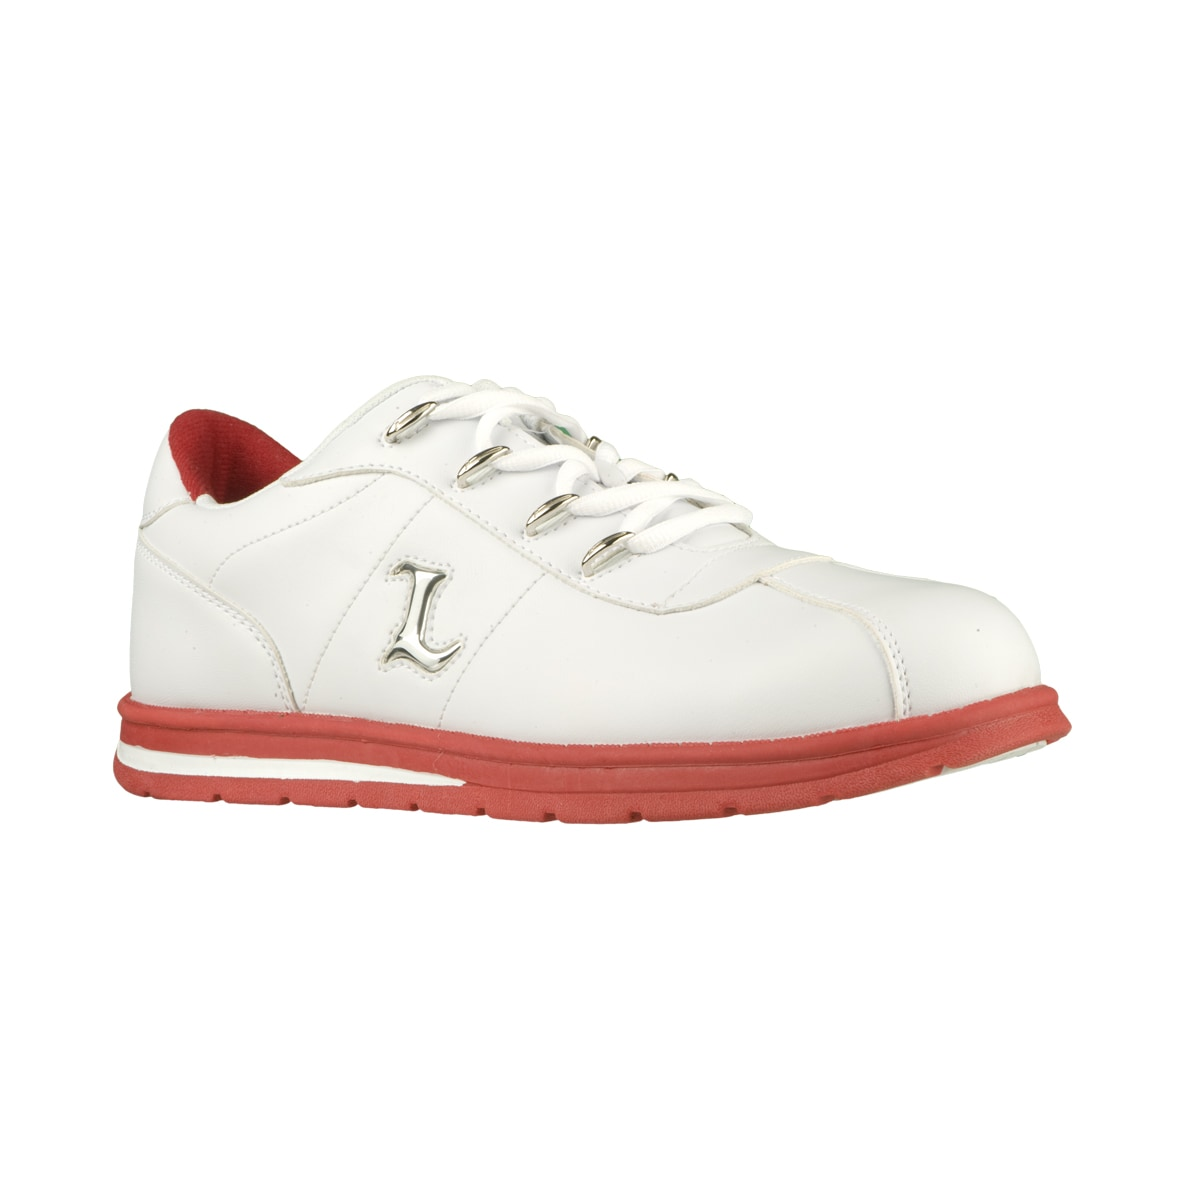 Lugz Men's 'Zrocs DX' Durabrush White/ Mars Red Sneakers